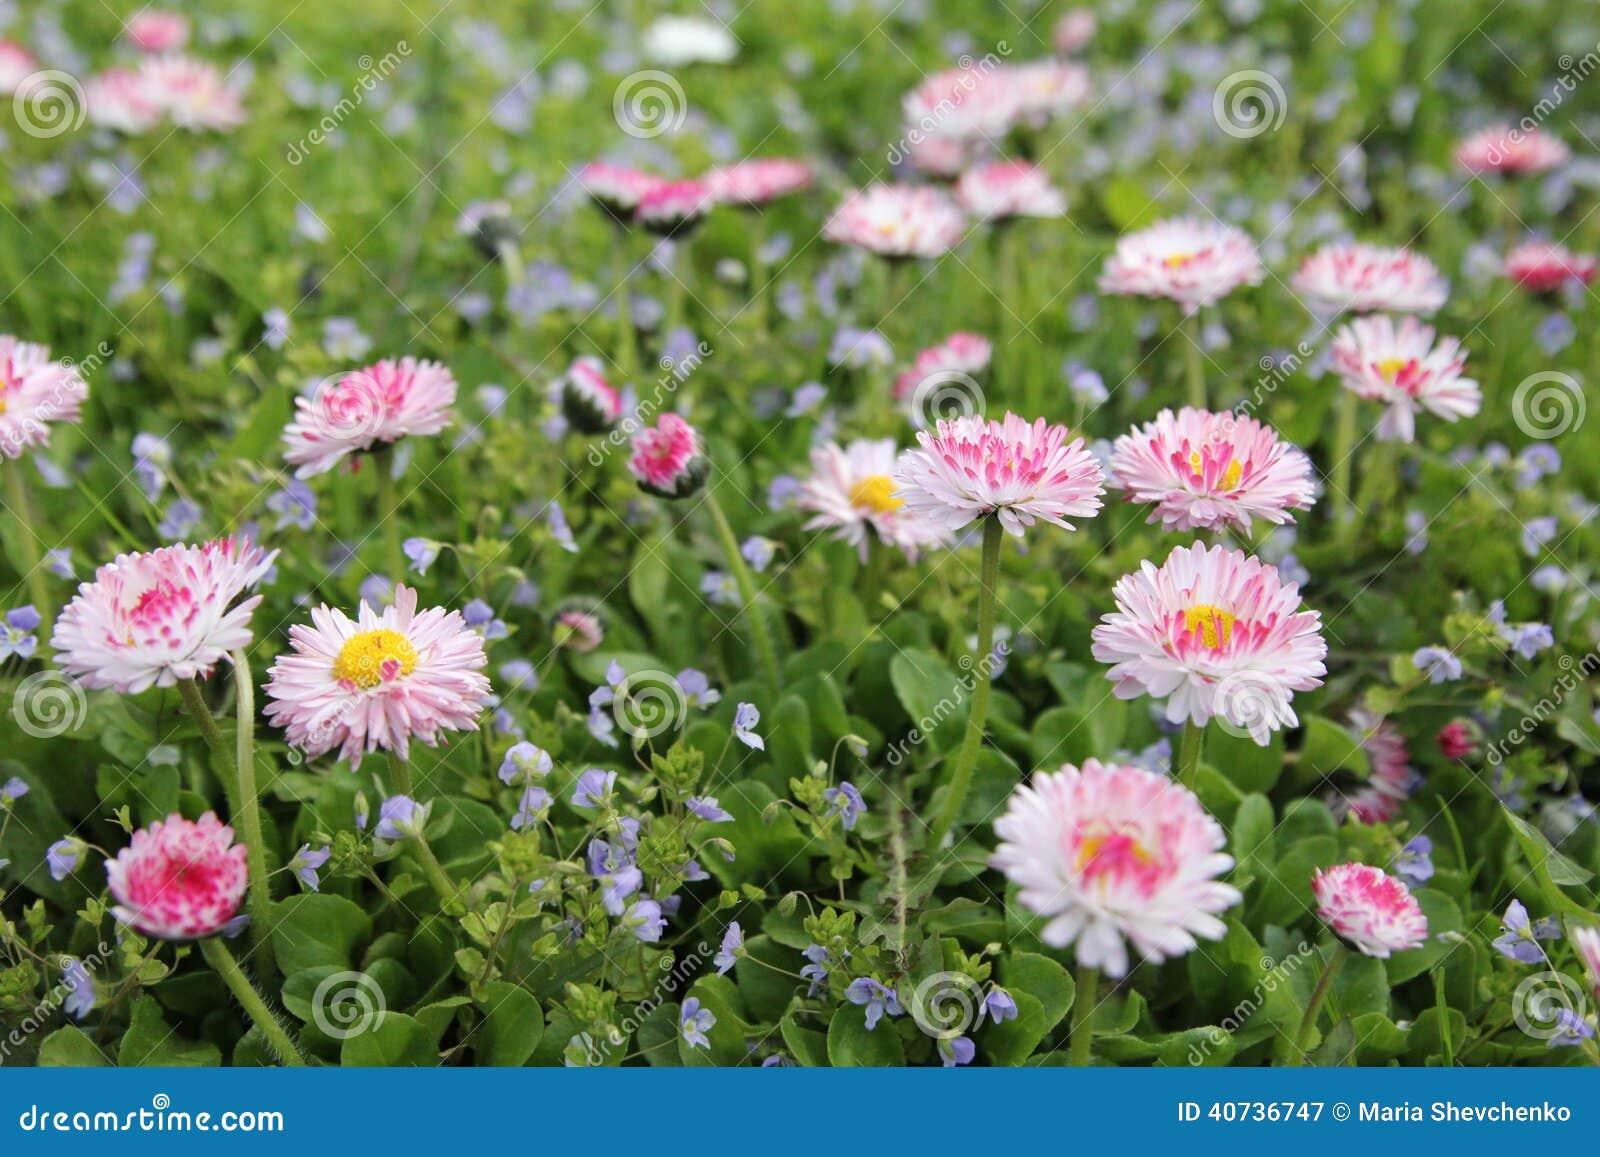 petites fleurs roses - marguerite photo stock - image: 40736747